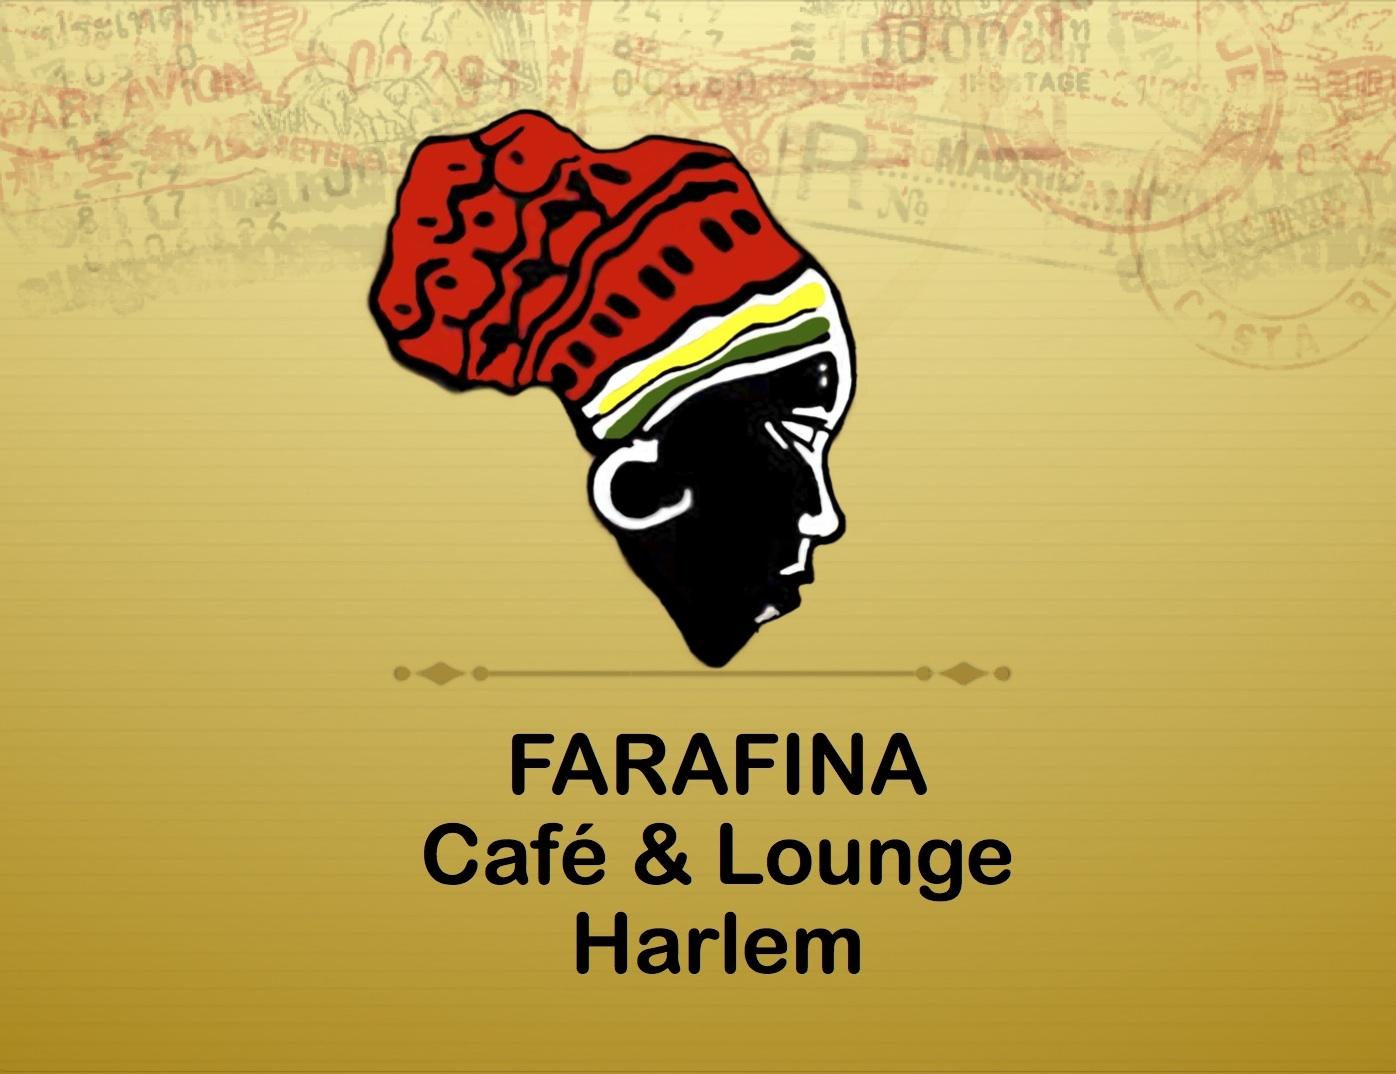 FARAFINA_New_LOGO_Crop_Pcard.169135332